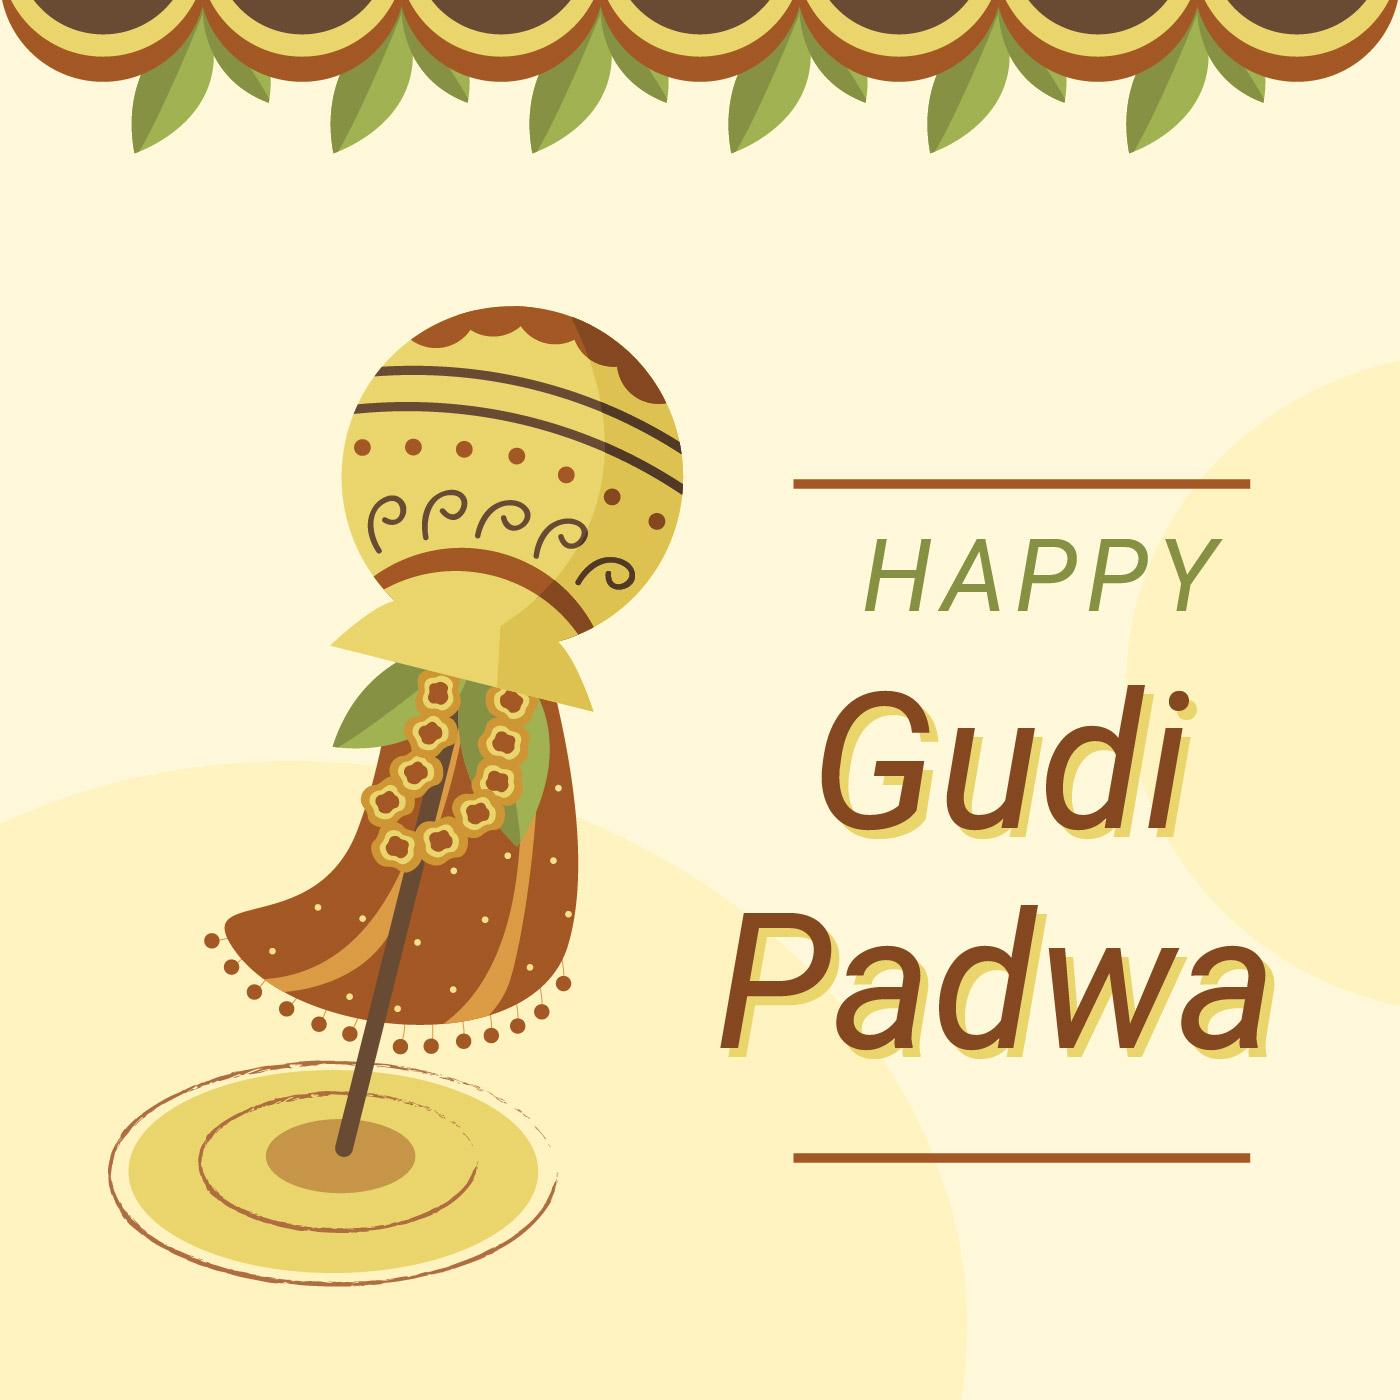 Gudi Padwa Celebration Vector Download Free Vector Art Stock